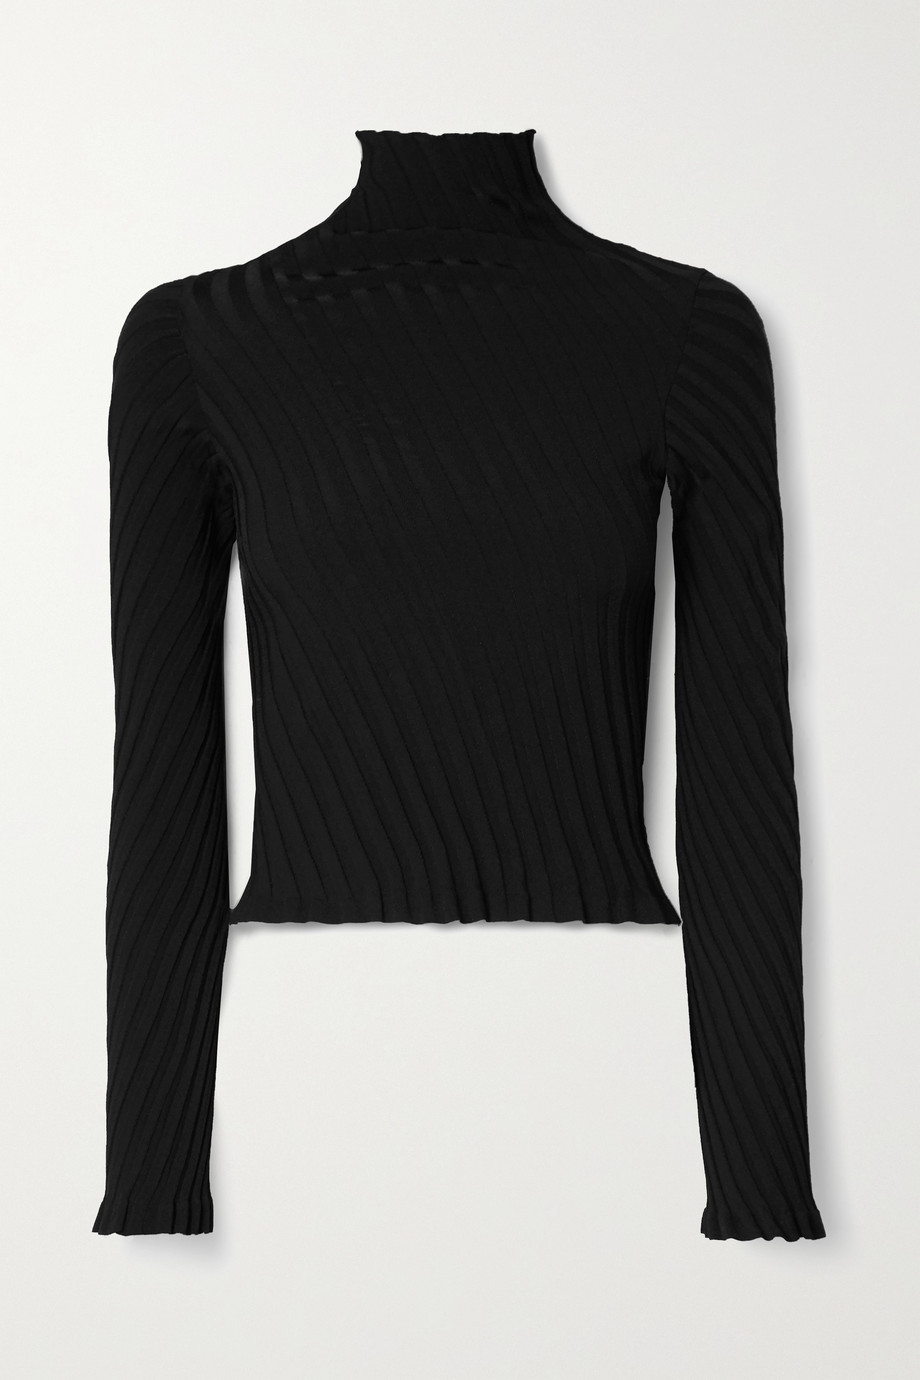 Balenciaga Ribbed-knit turtleneck sweater